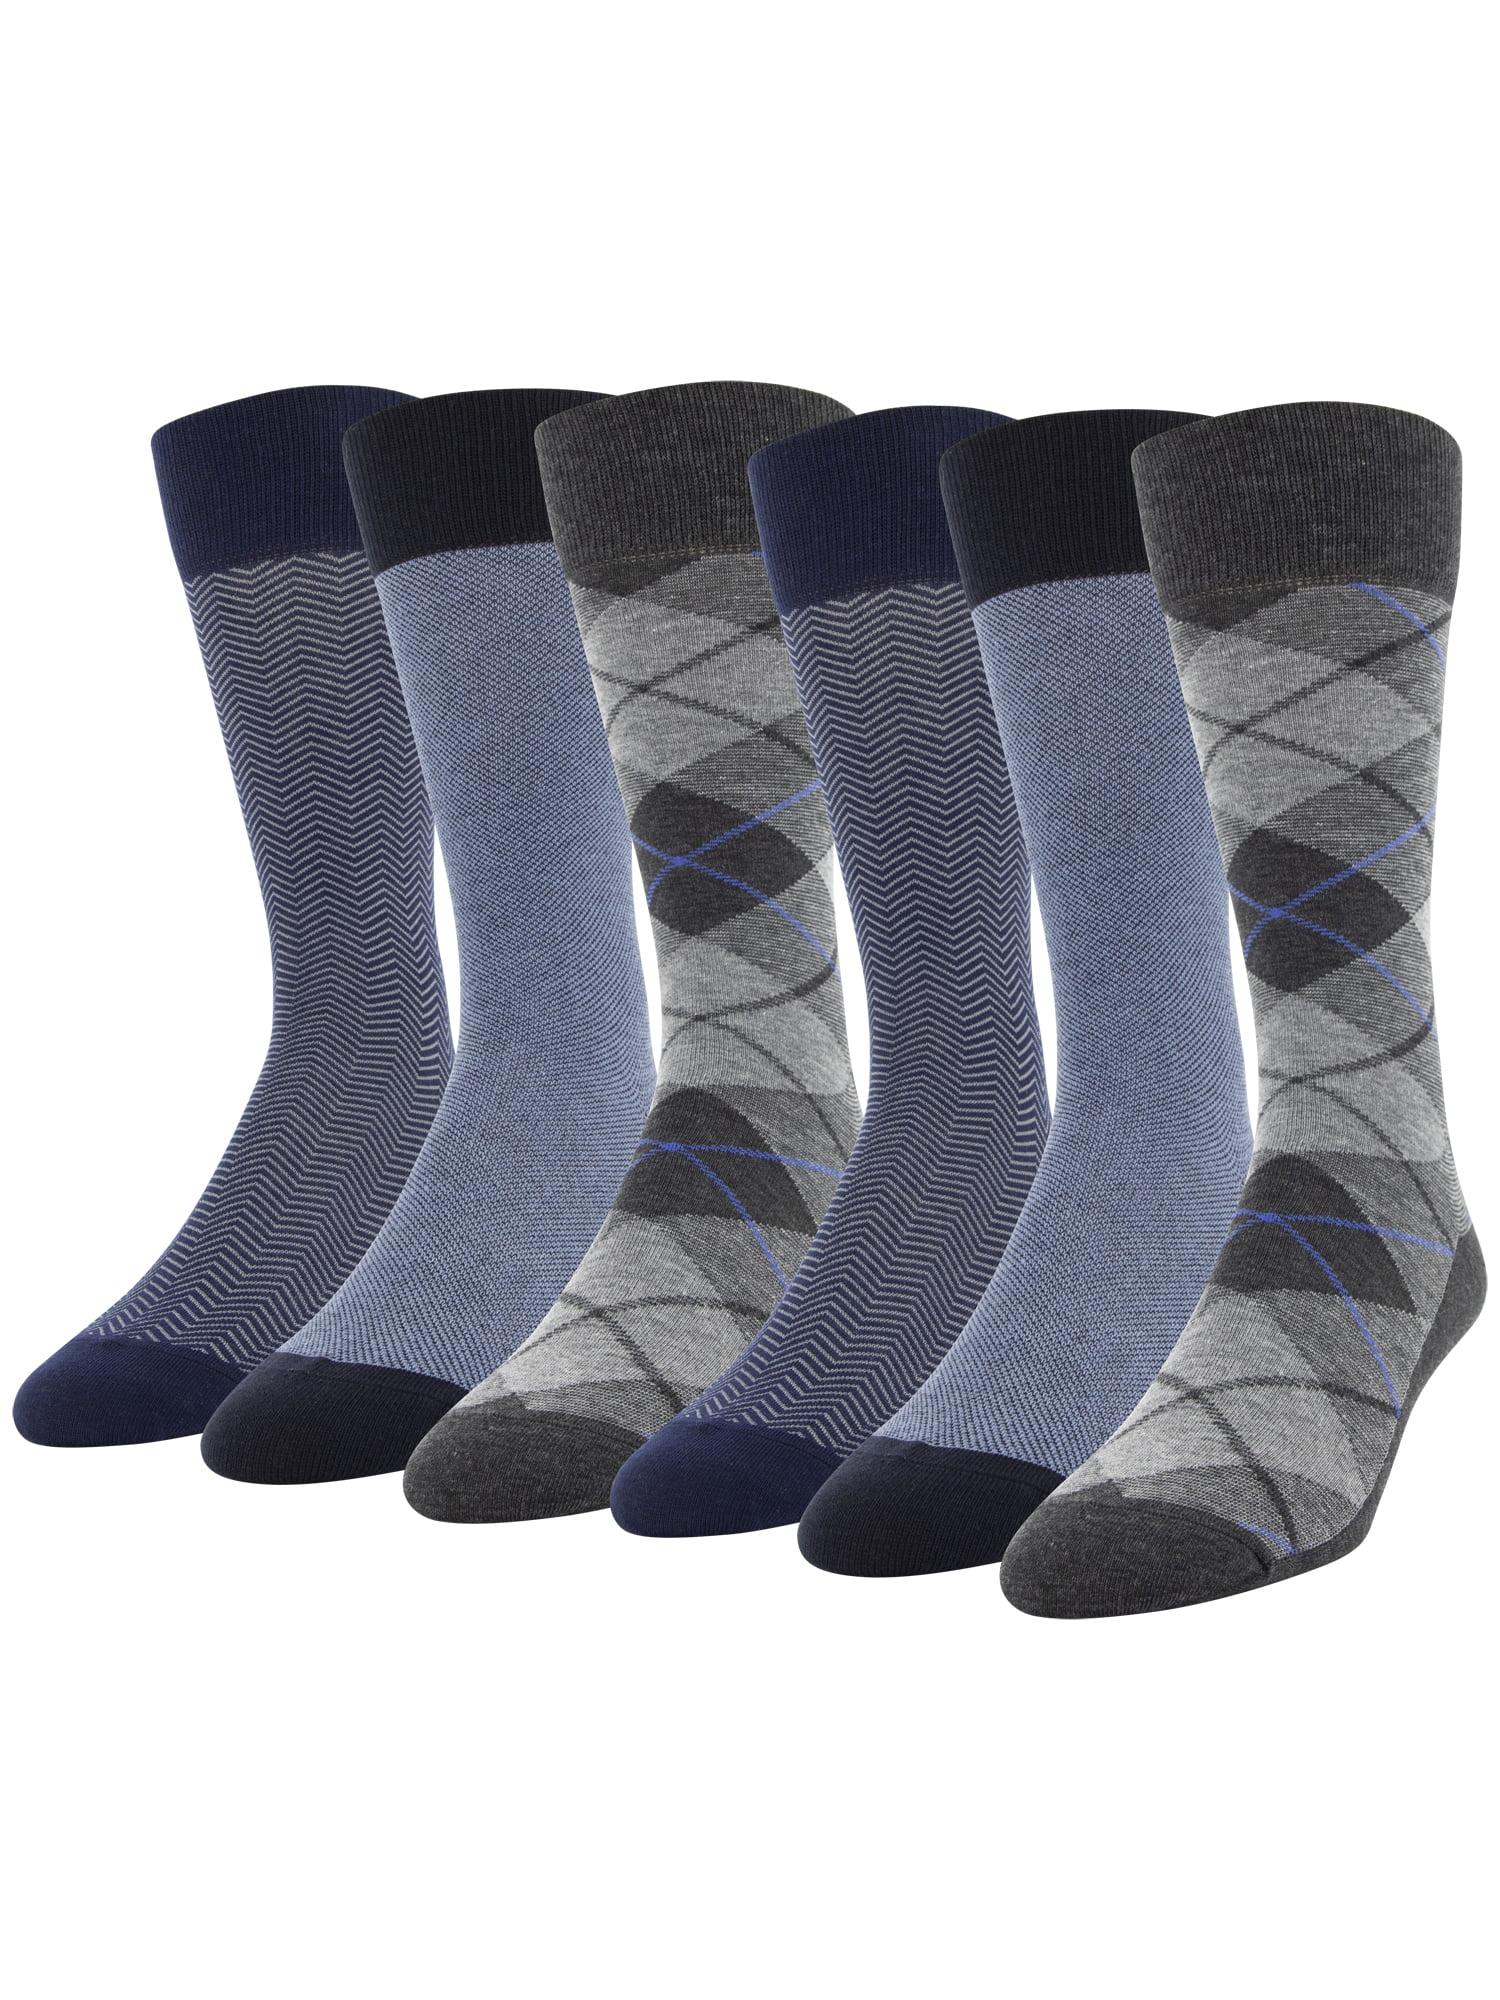 9 12 pairs non elastic diabetic socks Work  Size 4-7 Ladies Argyle print 3 6